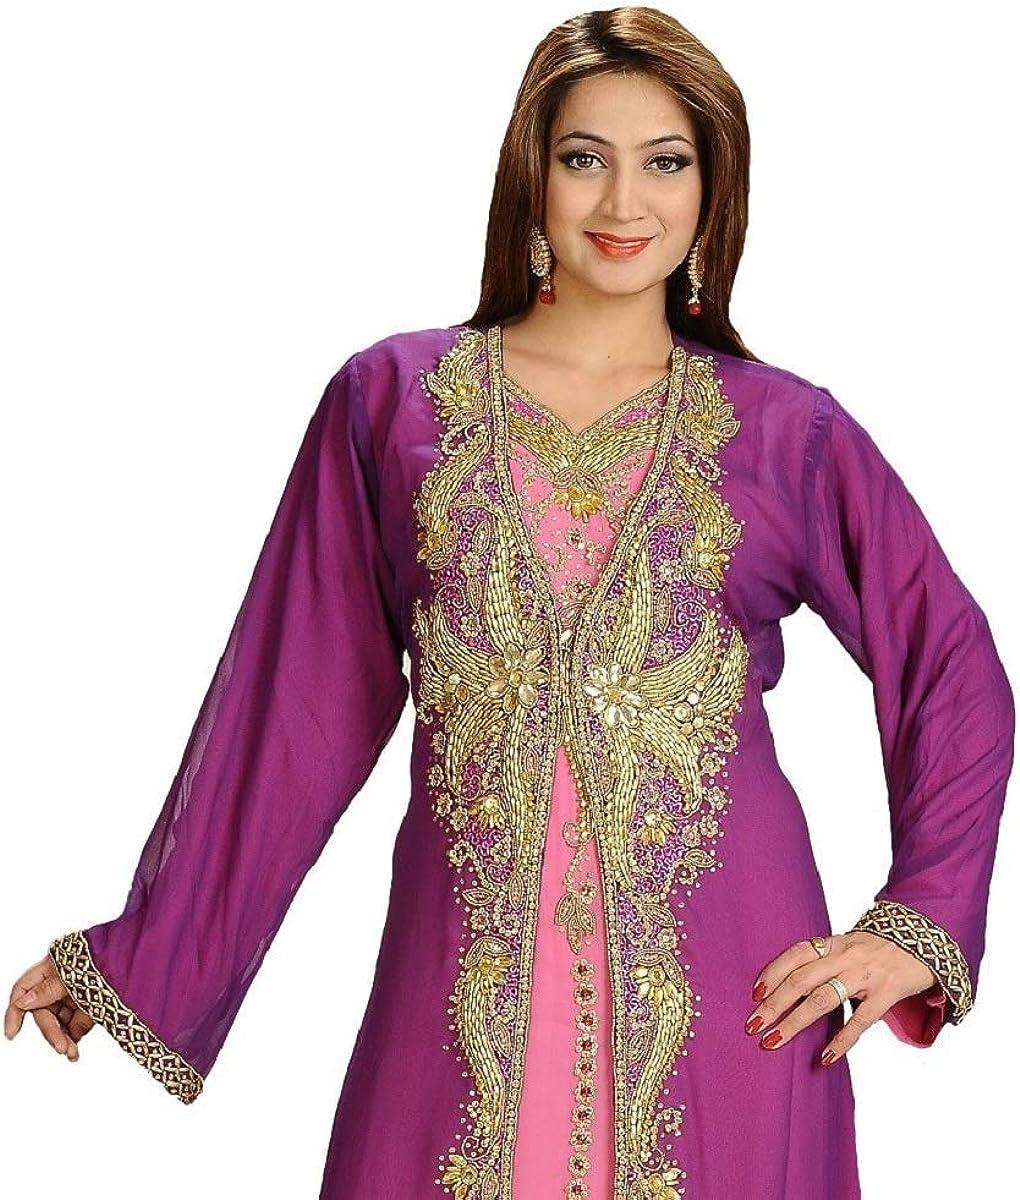 Black Arabian Kaftan Gown Tunic Crystal Embellished Chiffon Caftan Jalabiya Maxi